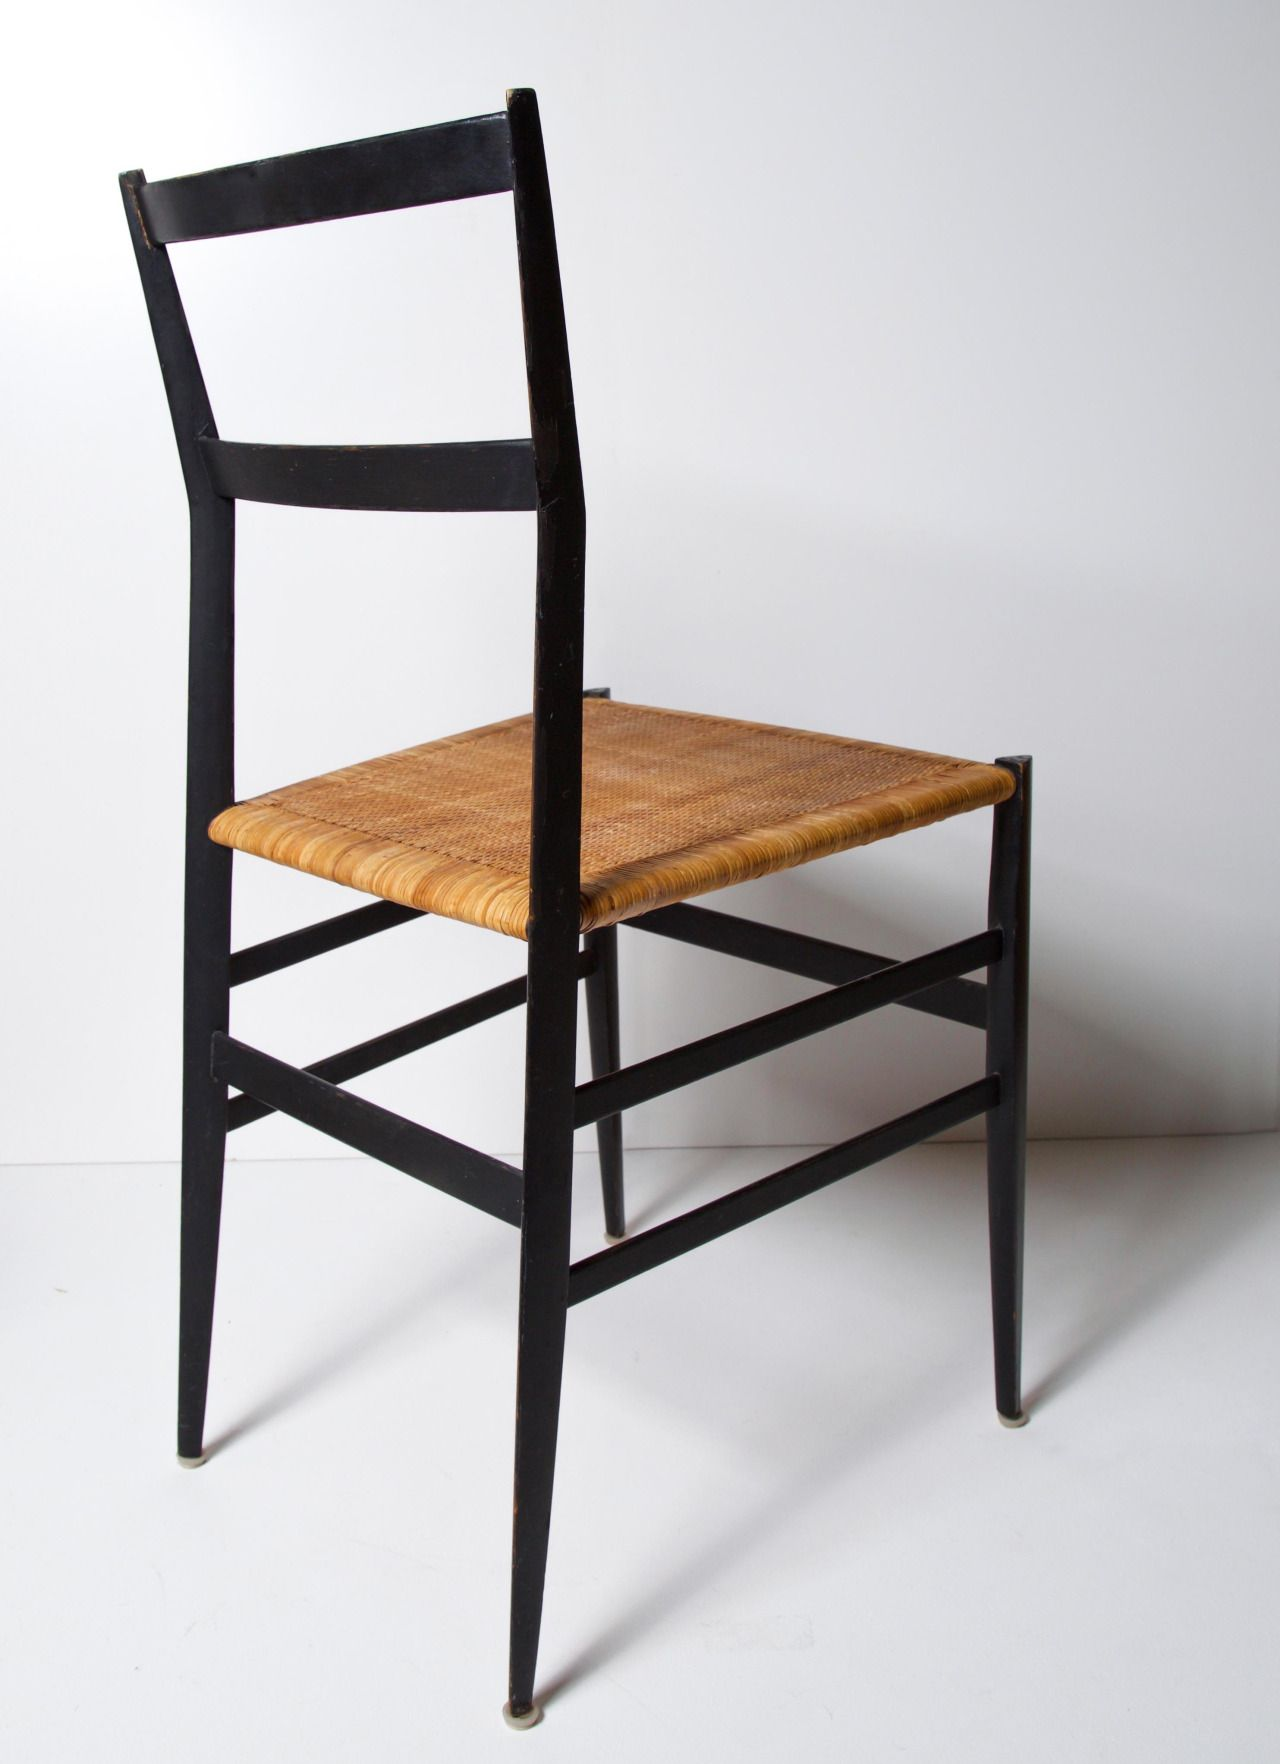 GIO PONTI, Superleggera Chair (engl.super Lightweight), 1957. Superleggera  Is Based On Ponti´s Earlier Leggera Chair From 1951 With A Very Similar ...